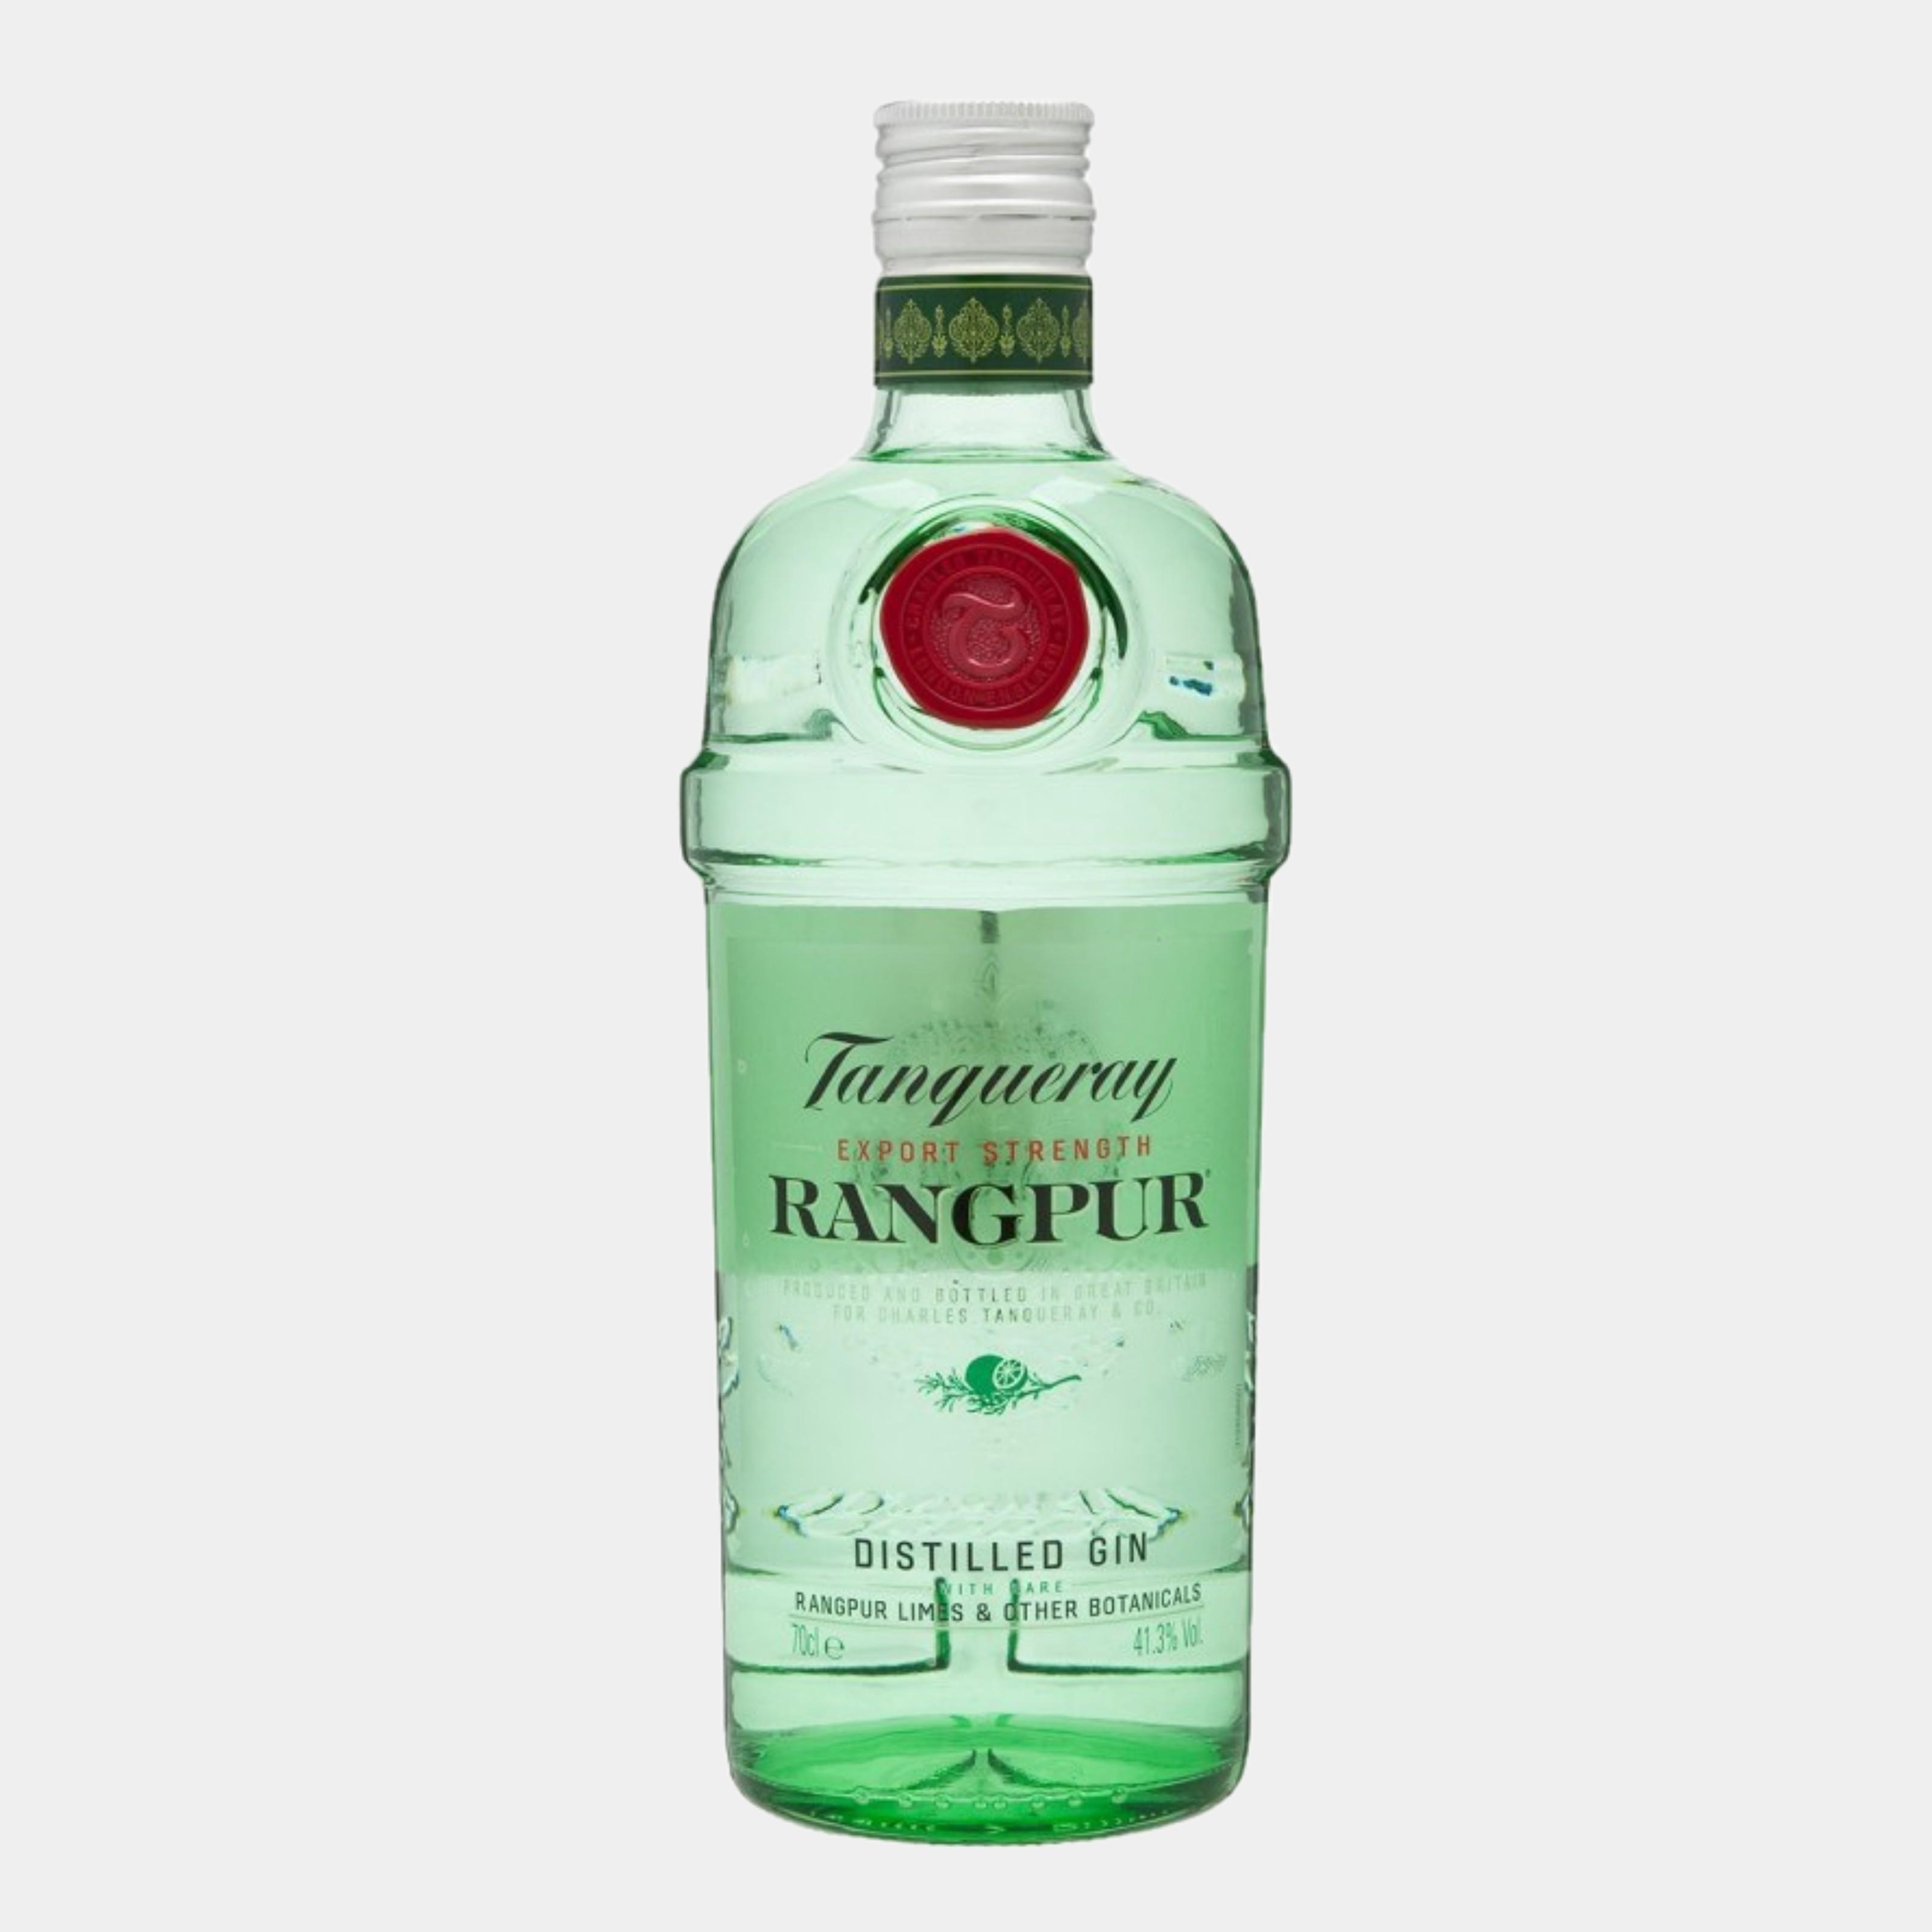 Tanqueray Rangpur Gin 0.7 L 41,3% Alk. Ginobility